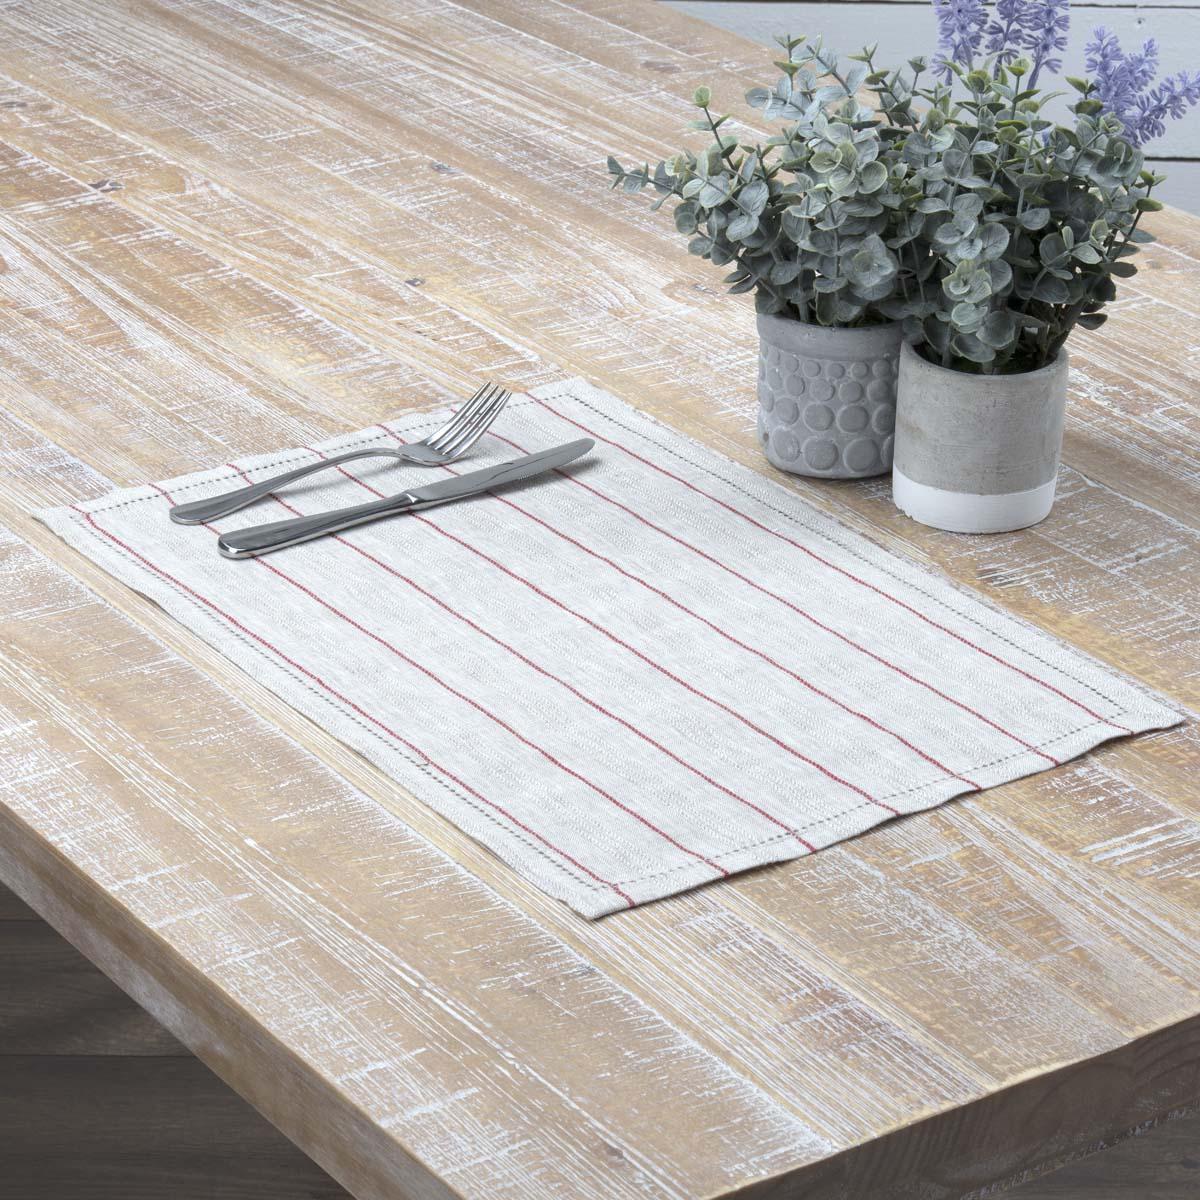 vhc farmhouse placemat set of 6 table mats linen white on farmhouse colors for bath mats walmart id=36075